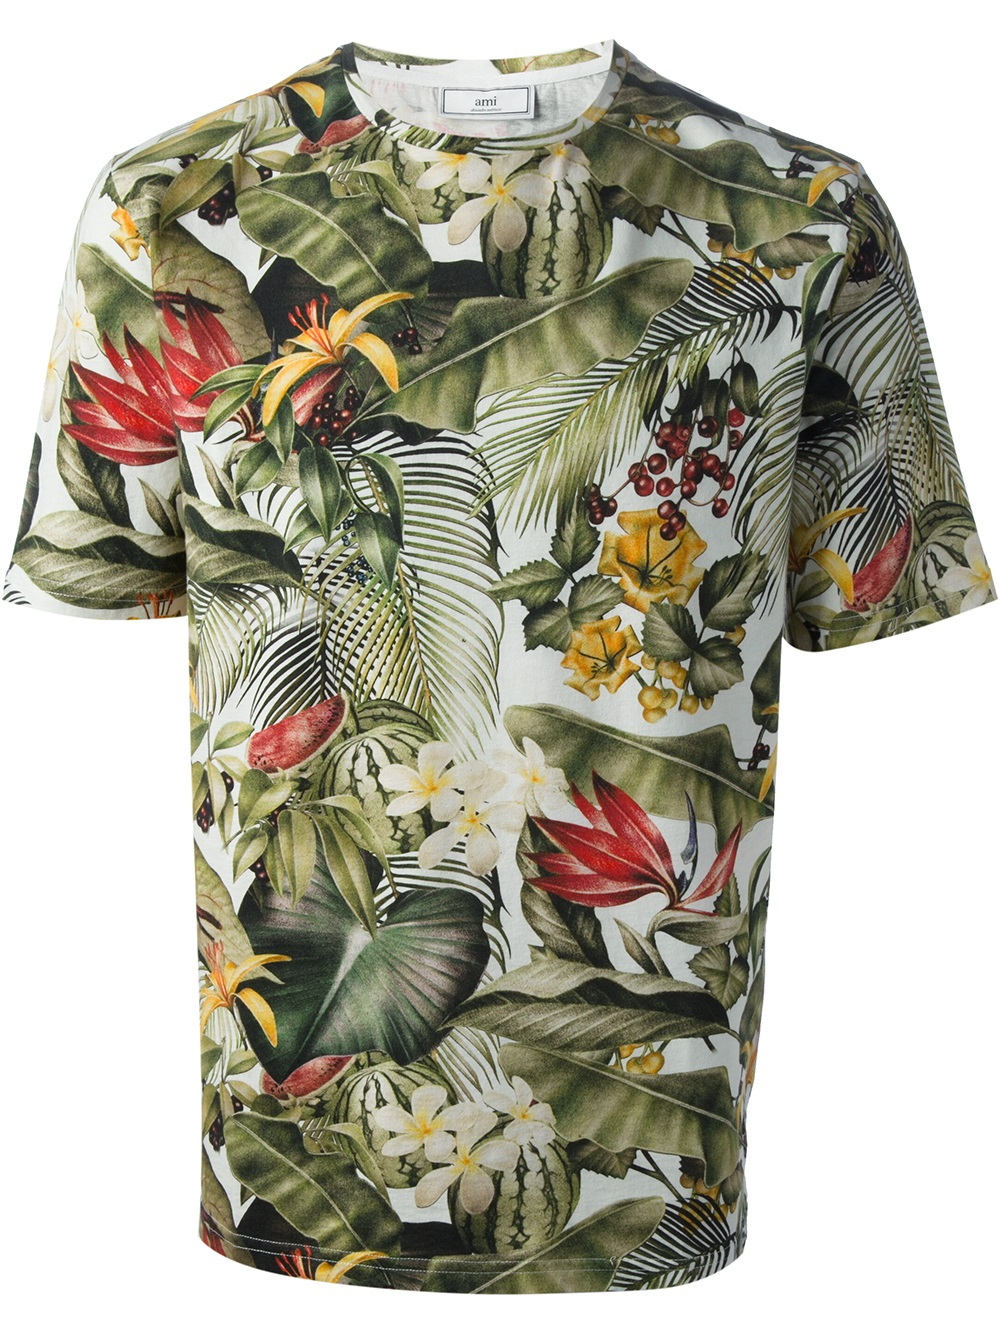 Lyst ami tropical print tshirt in white for men for Lsu hawaiian print shirts